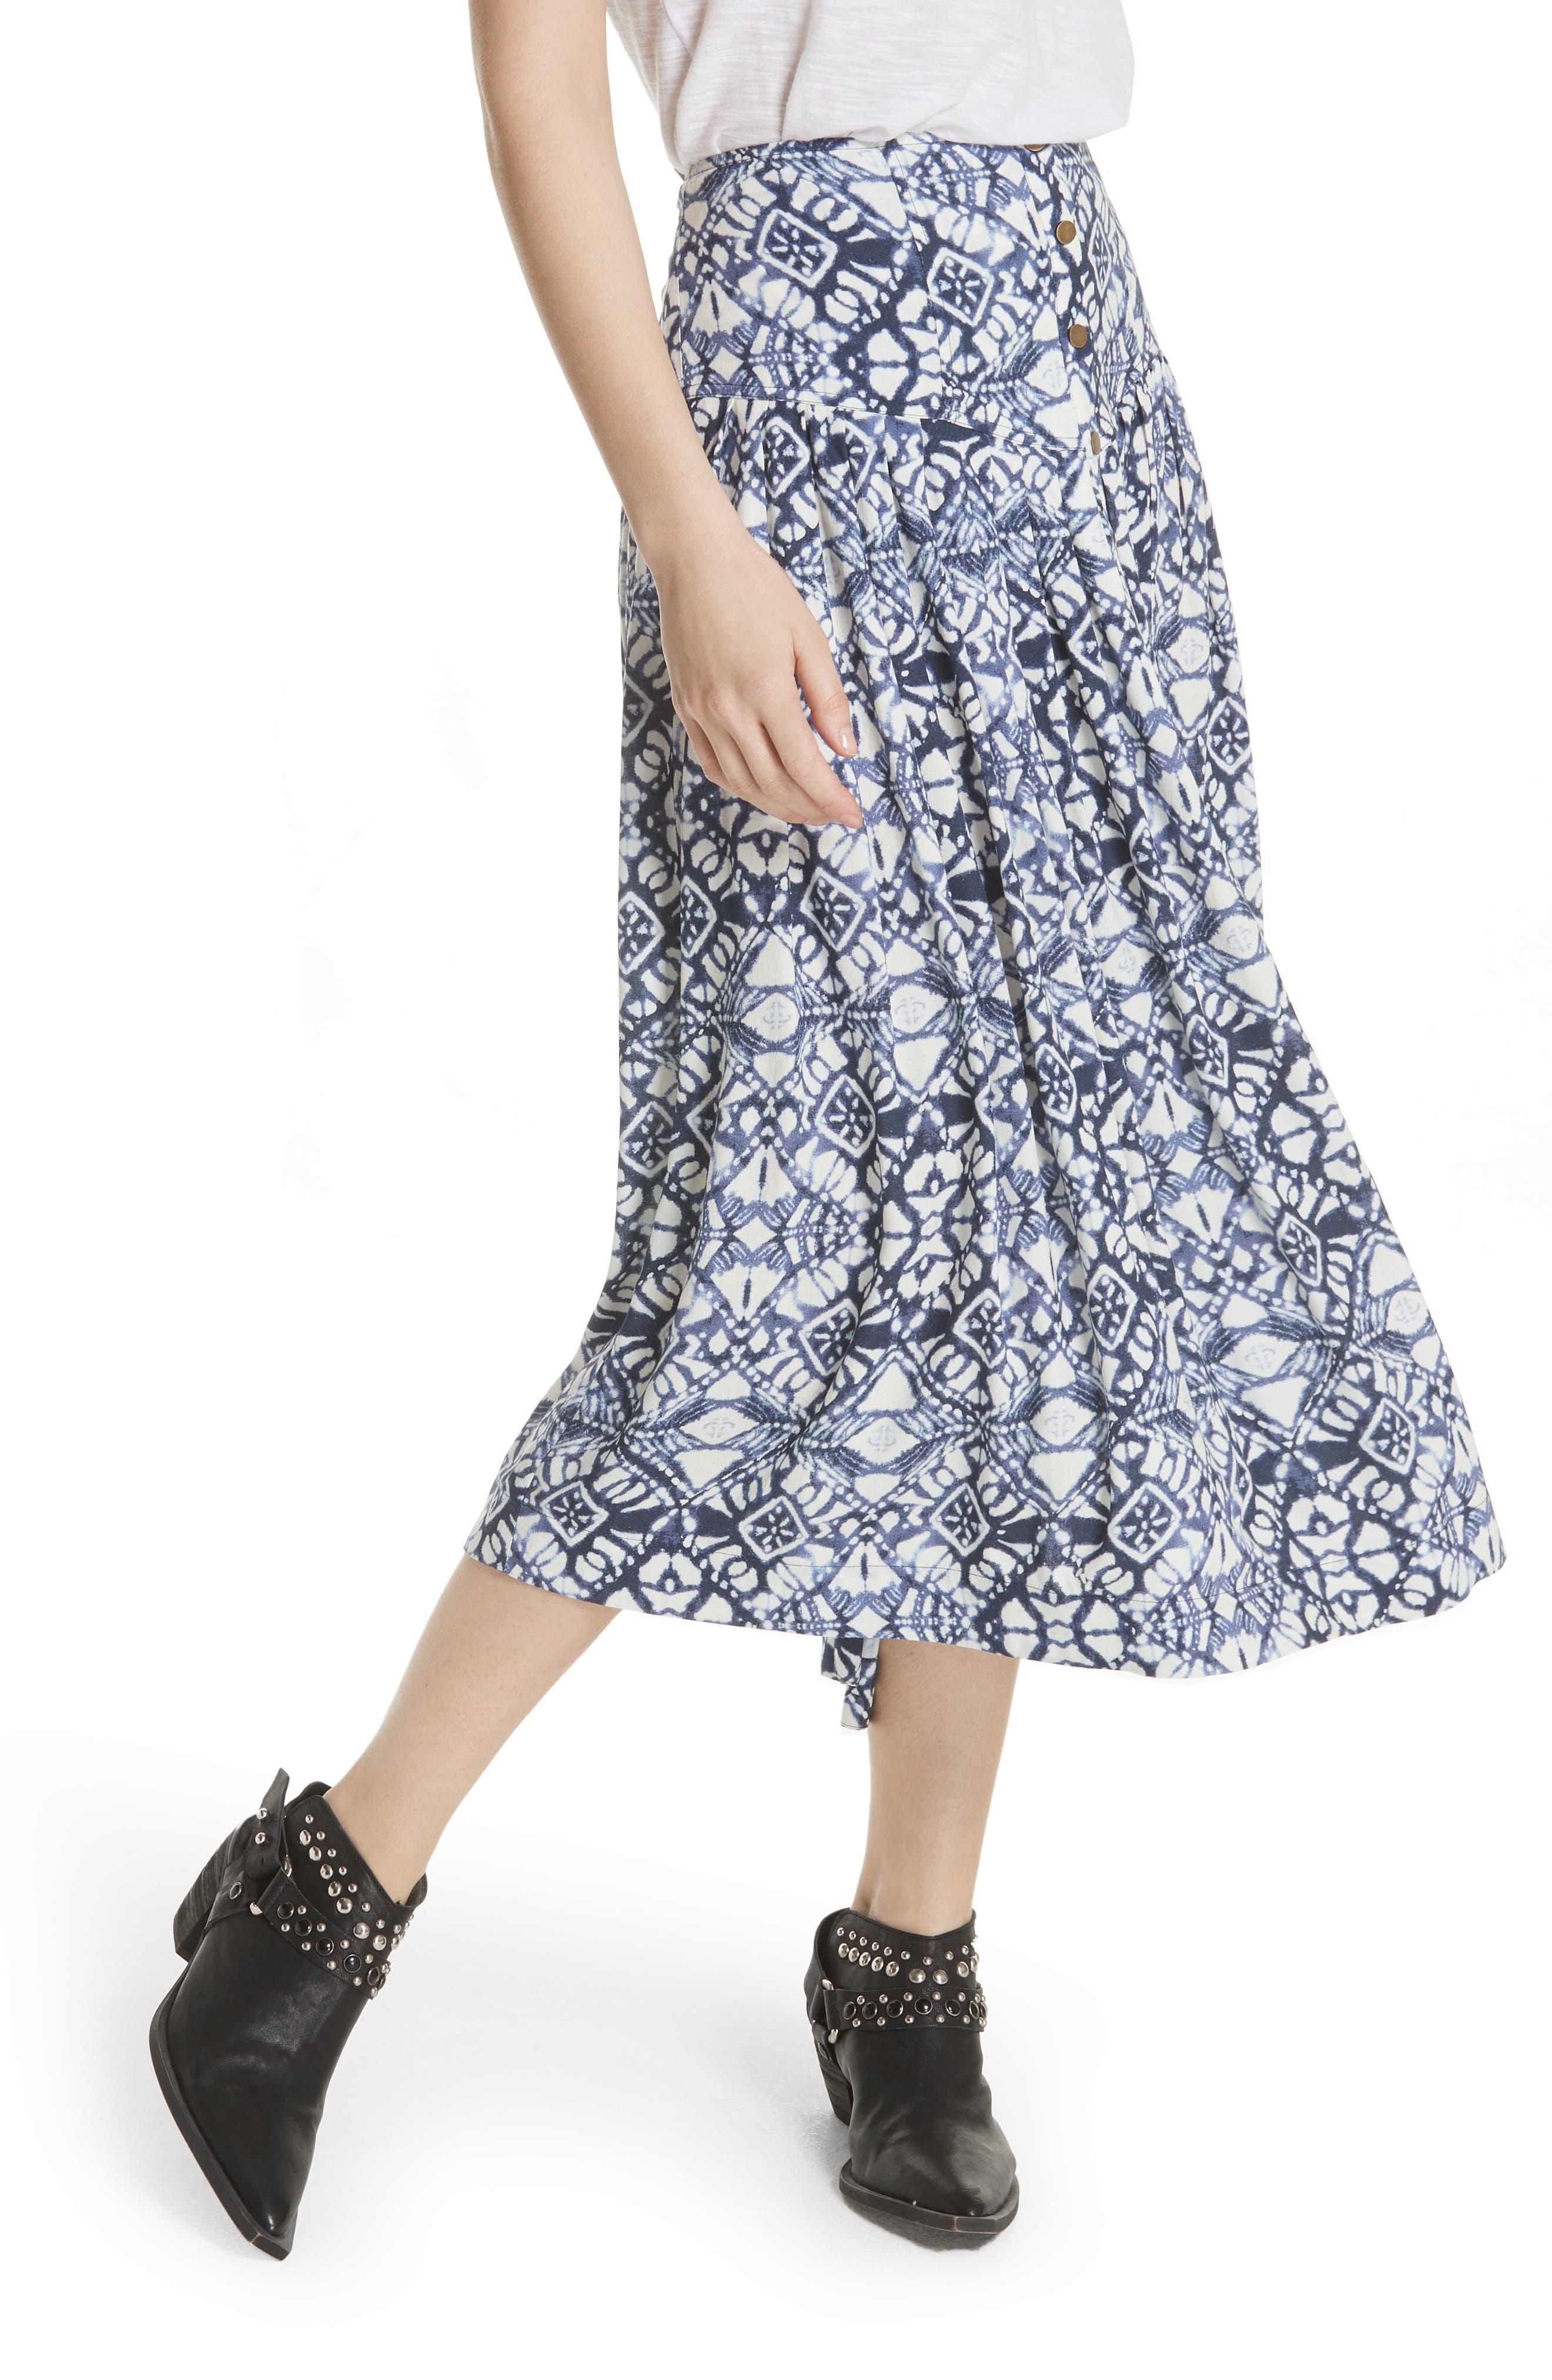 Lovers Dream Midi Skirt,                             Main thumbnail 1, color,                             401